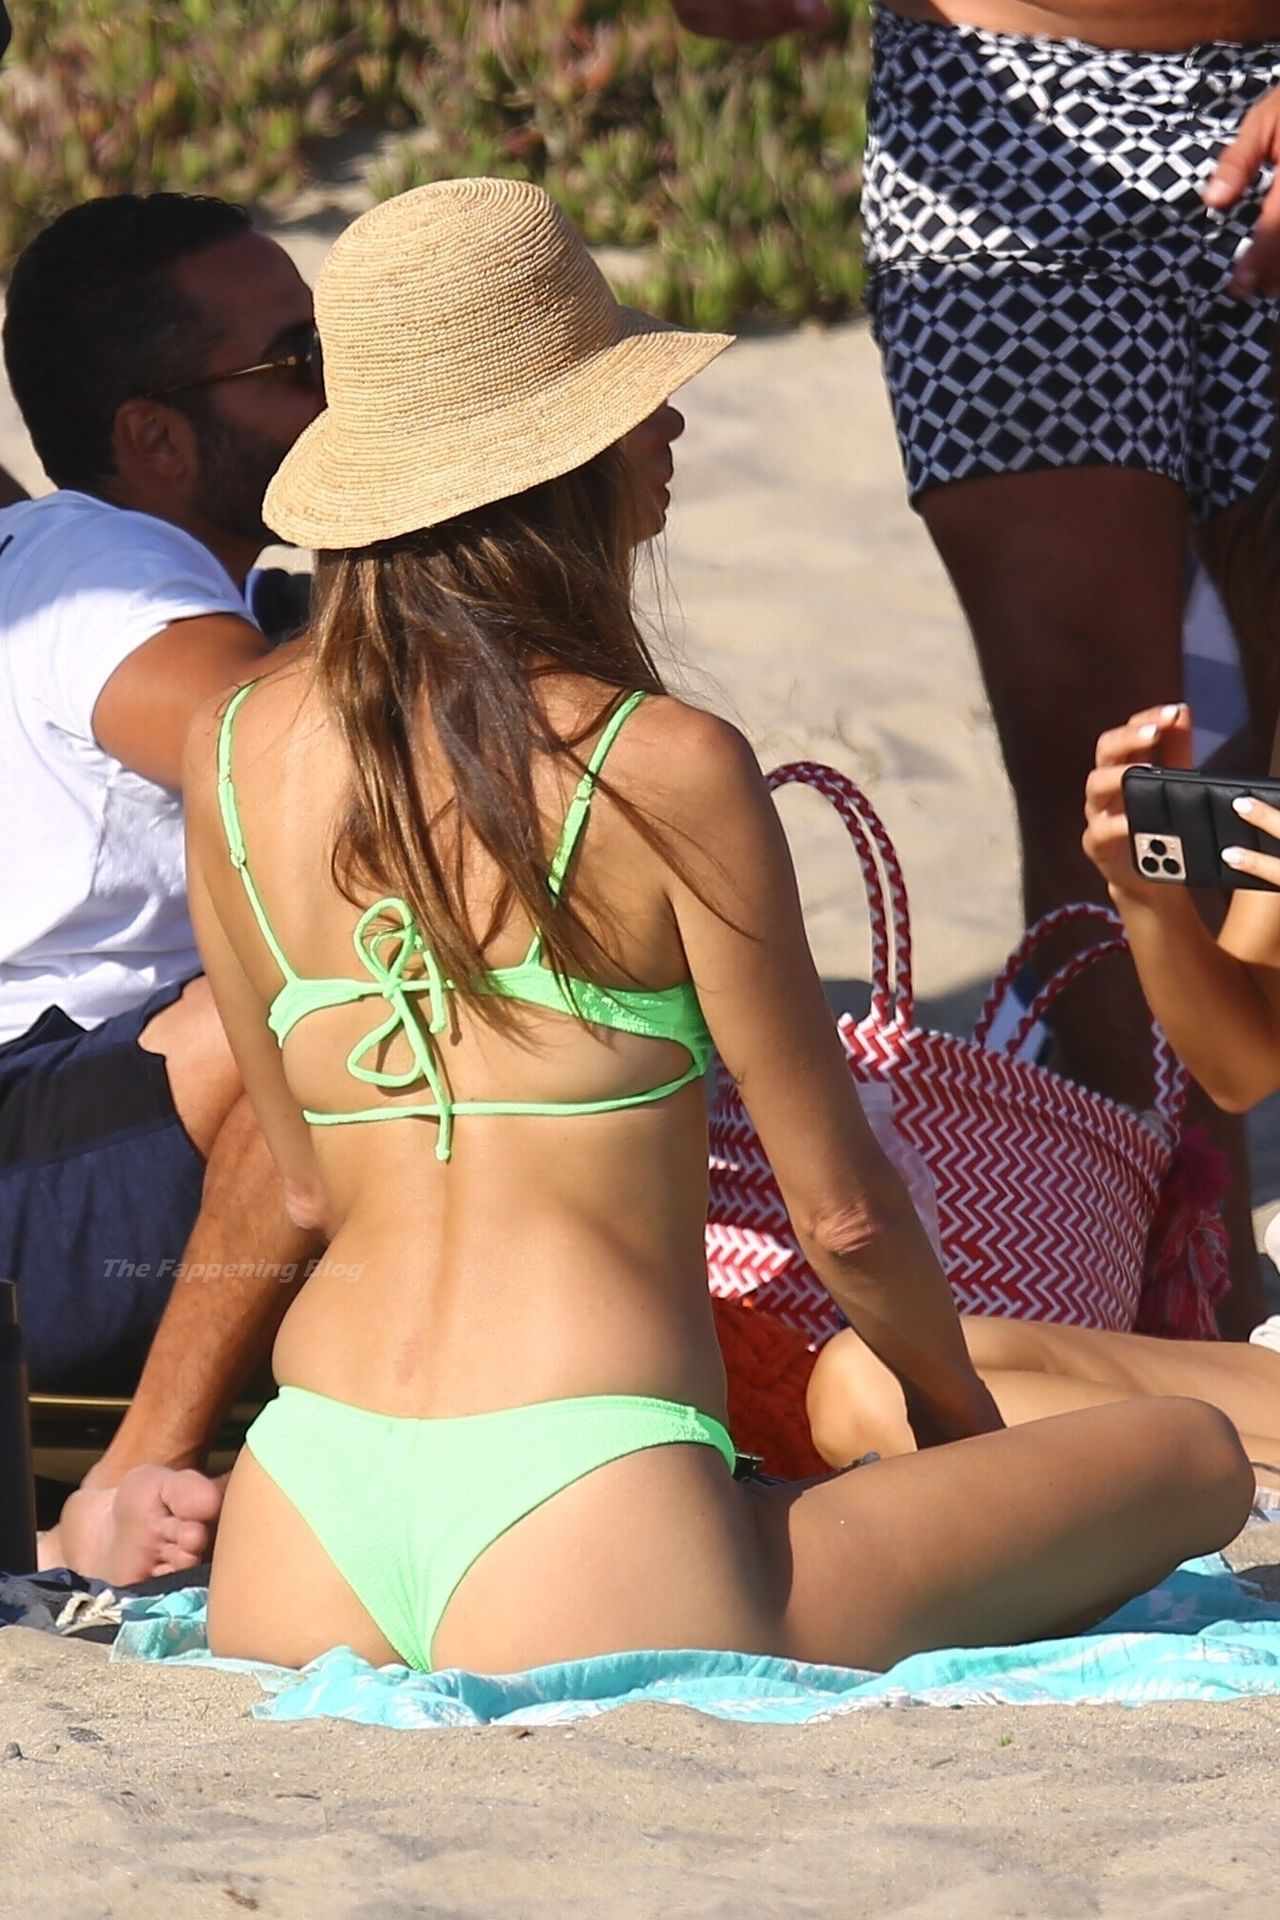 Alessandra-Ambrosio-Sexy-The-Fappening-Blog-1021.jpg